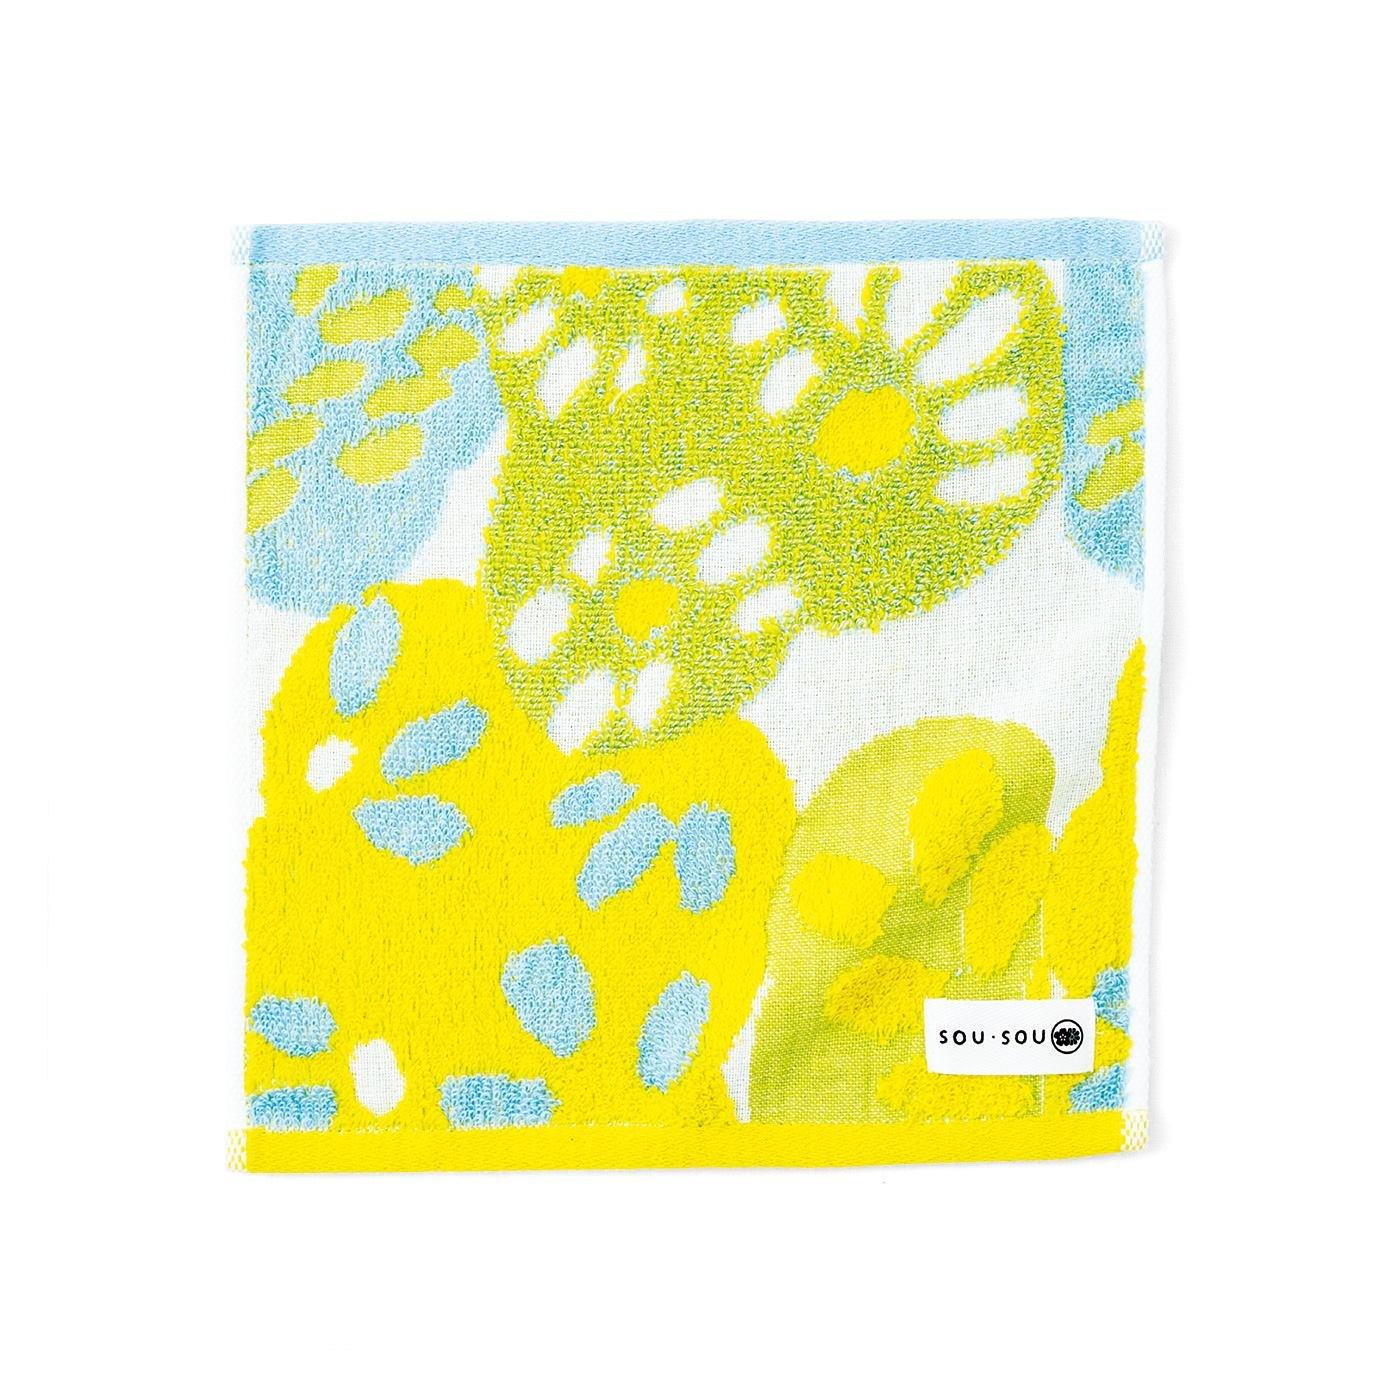 Squee! 「SOU・SOU」×「今治タオル」 肌ざわりやわらかジャカード織りハンカチの会